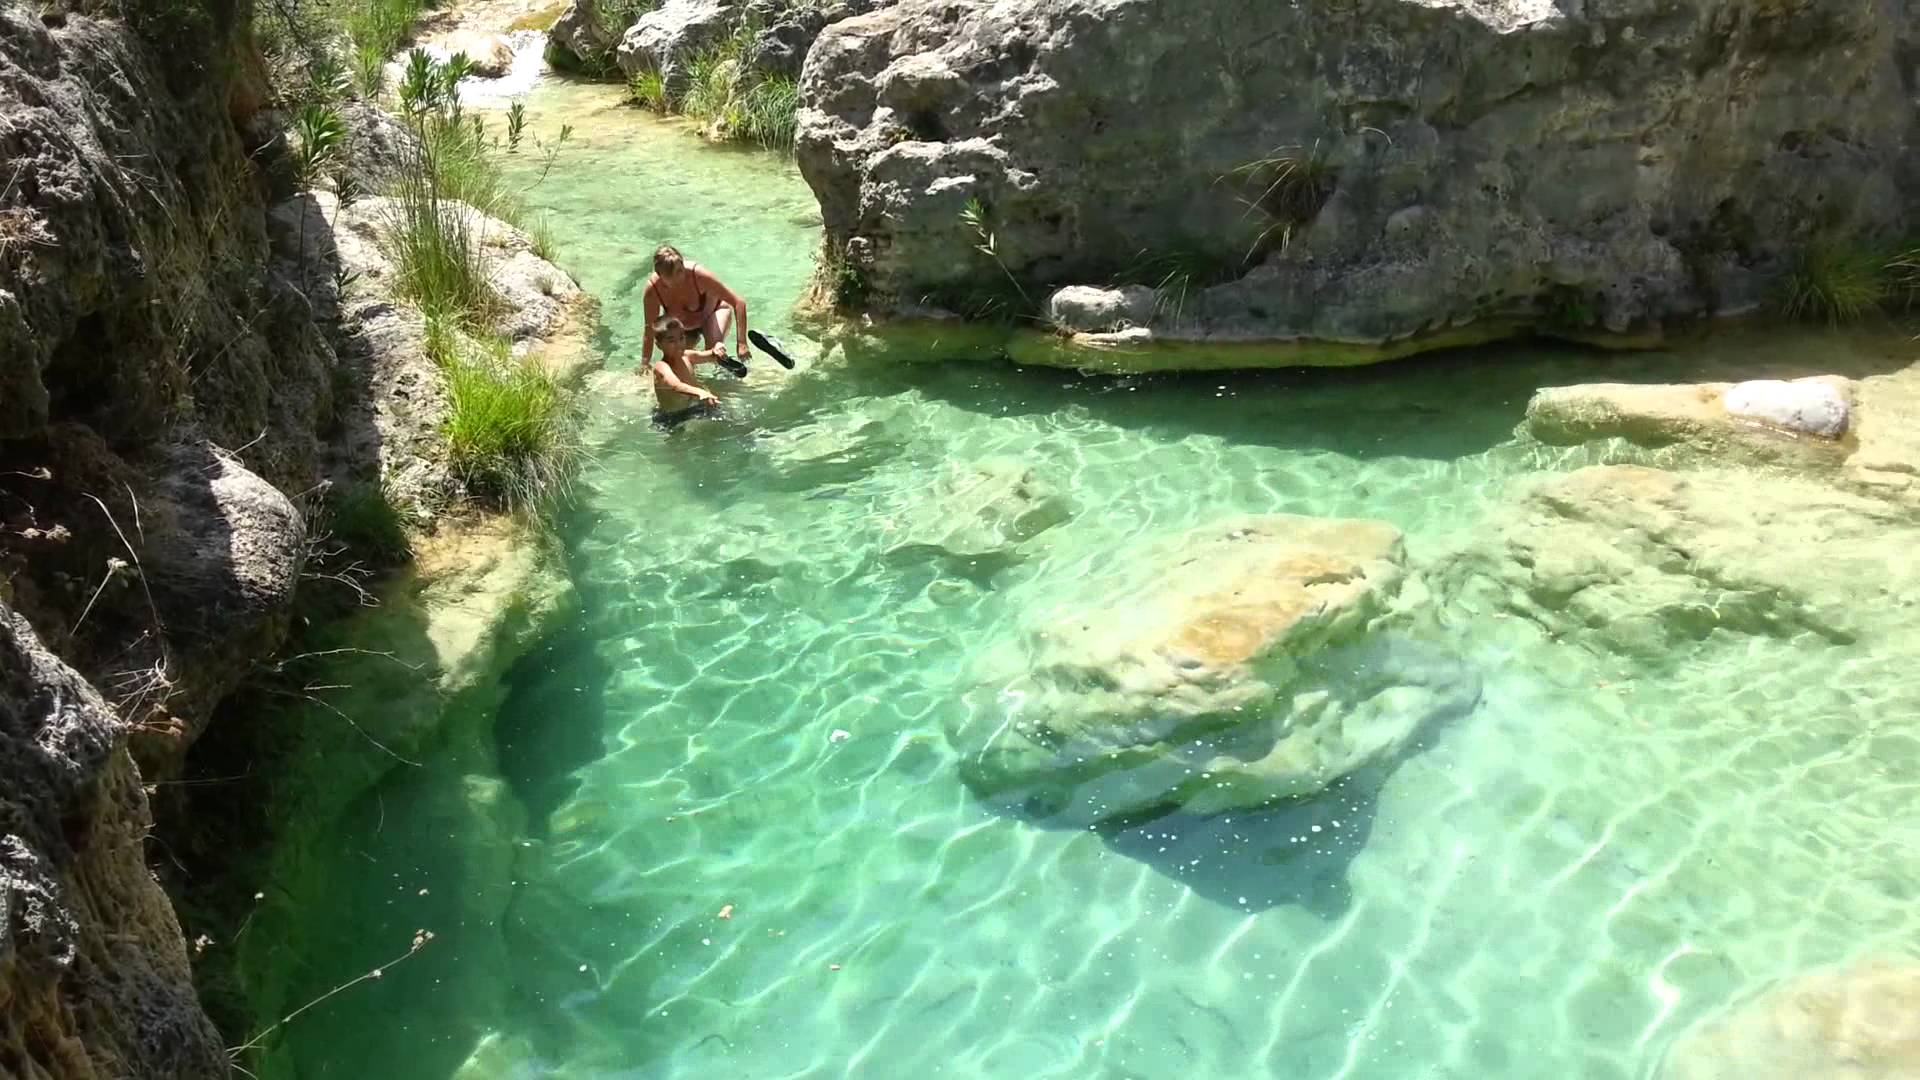 Piscinas naturales de la comunitat valenciana colegio for Escapada rural piscinas naturales